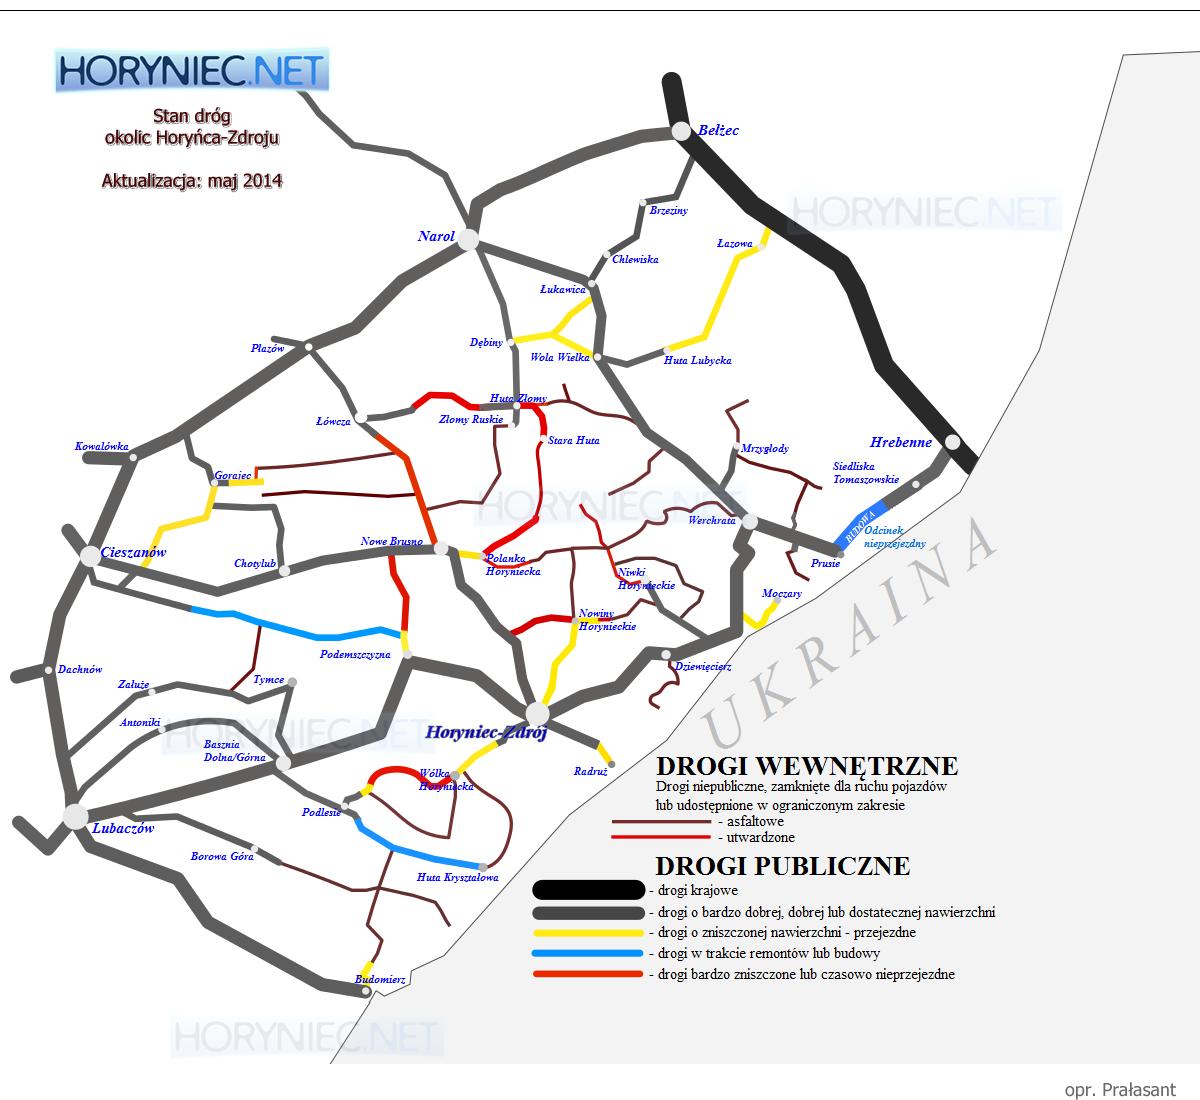 Stan dróg okolic Horyńca-Zdroju